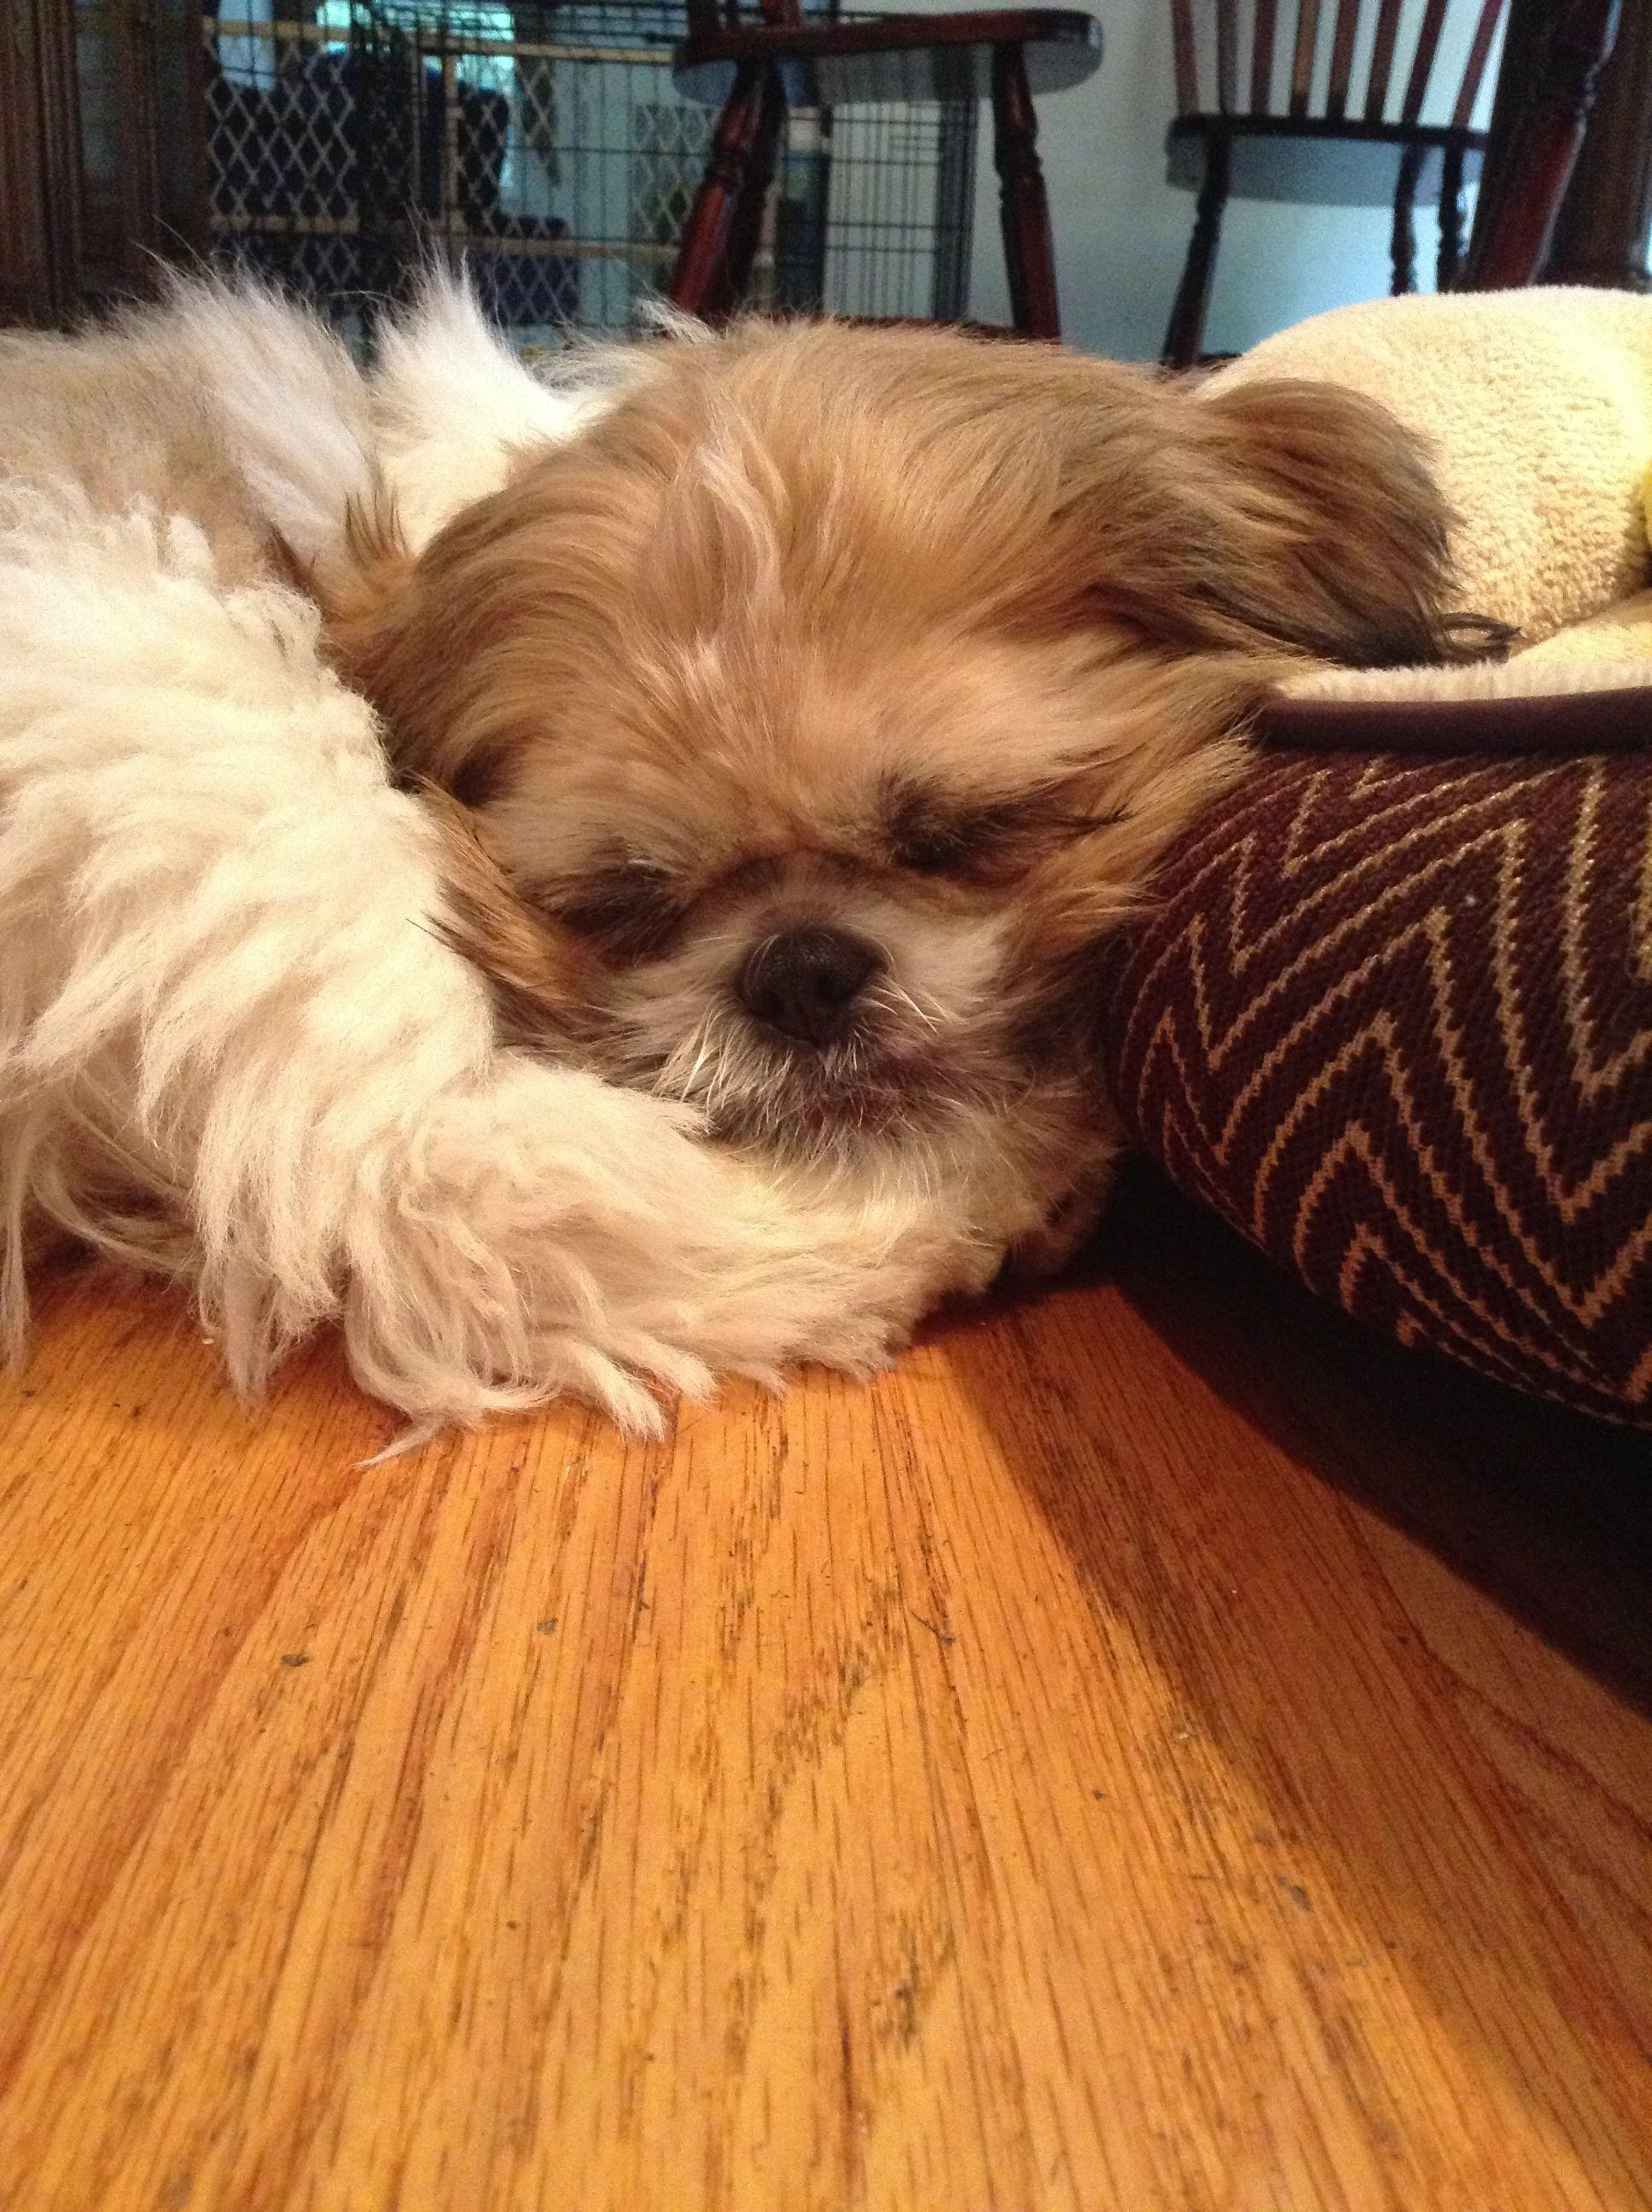 My Perfect Sleeping Puppy He S A Shih Tzu Named Toby Shih Tzu Dog Shih Tzu Shih Tzu Puppy